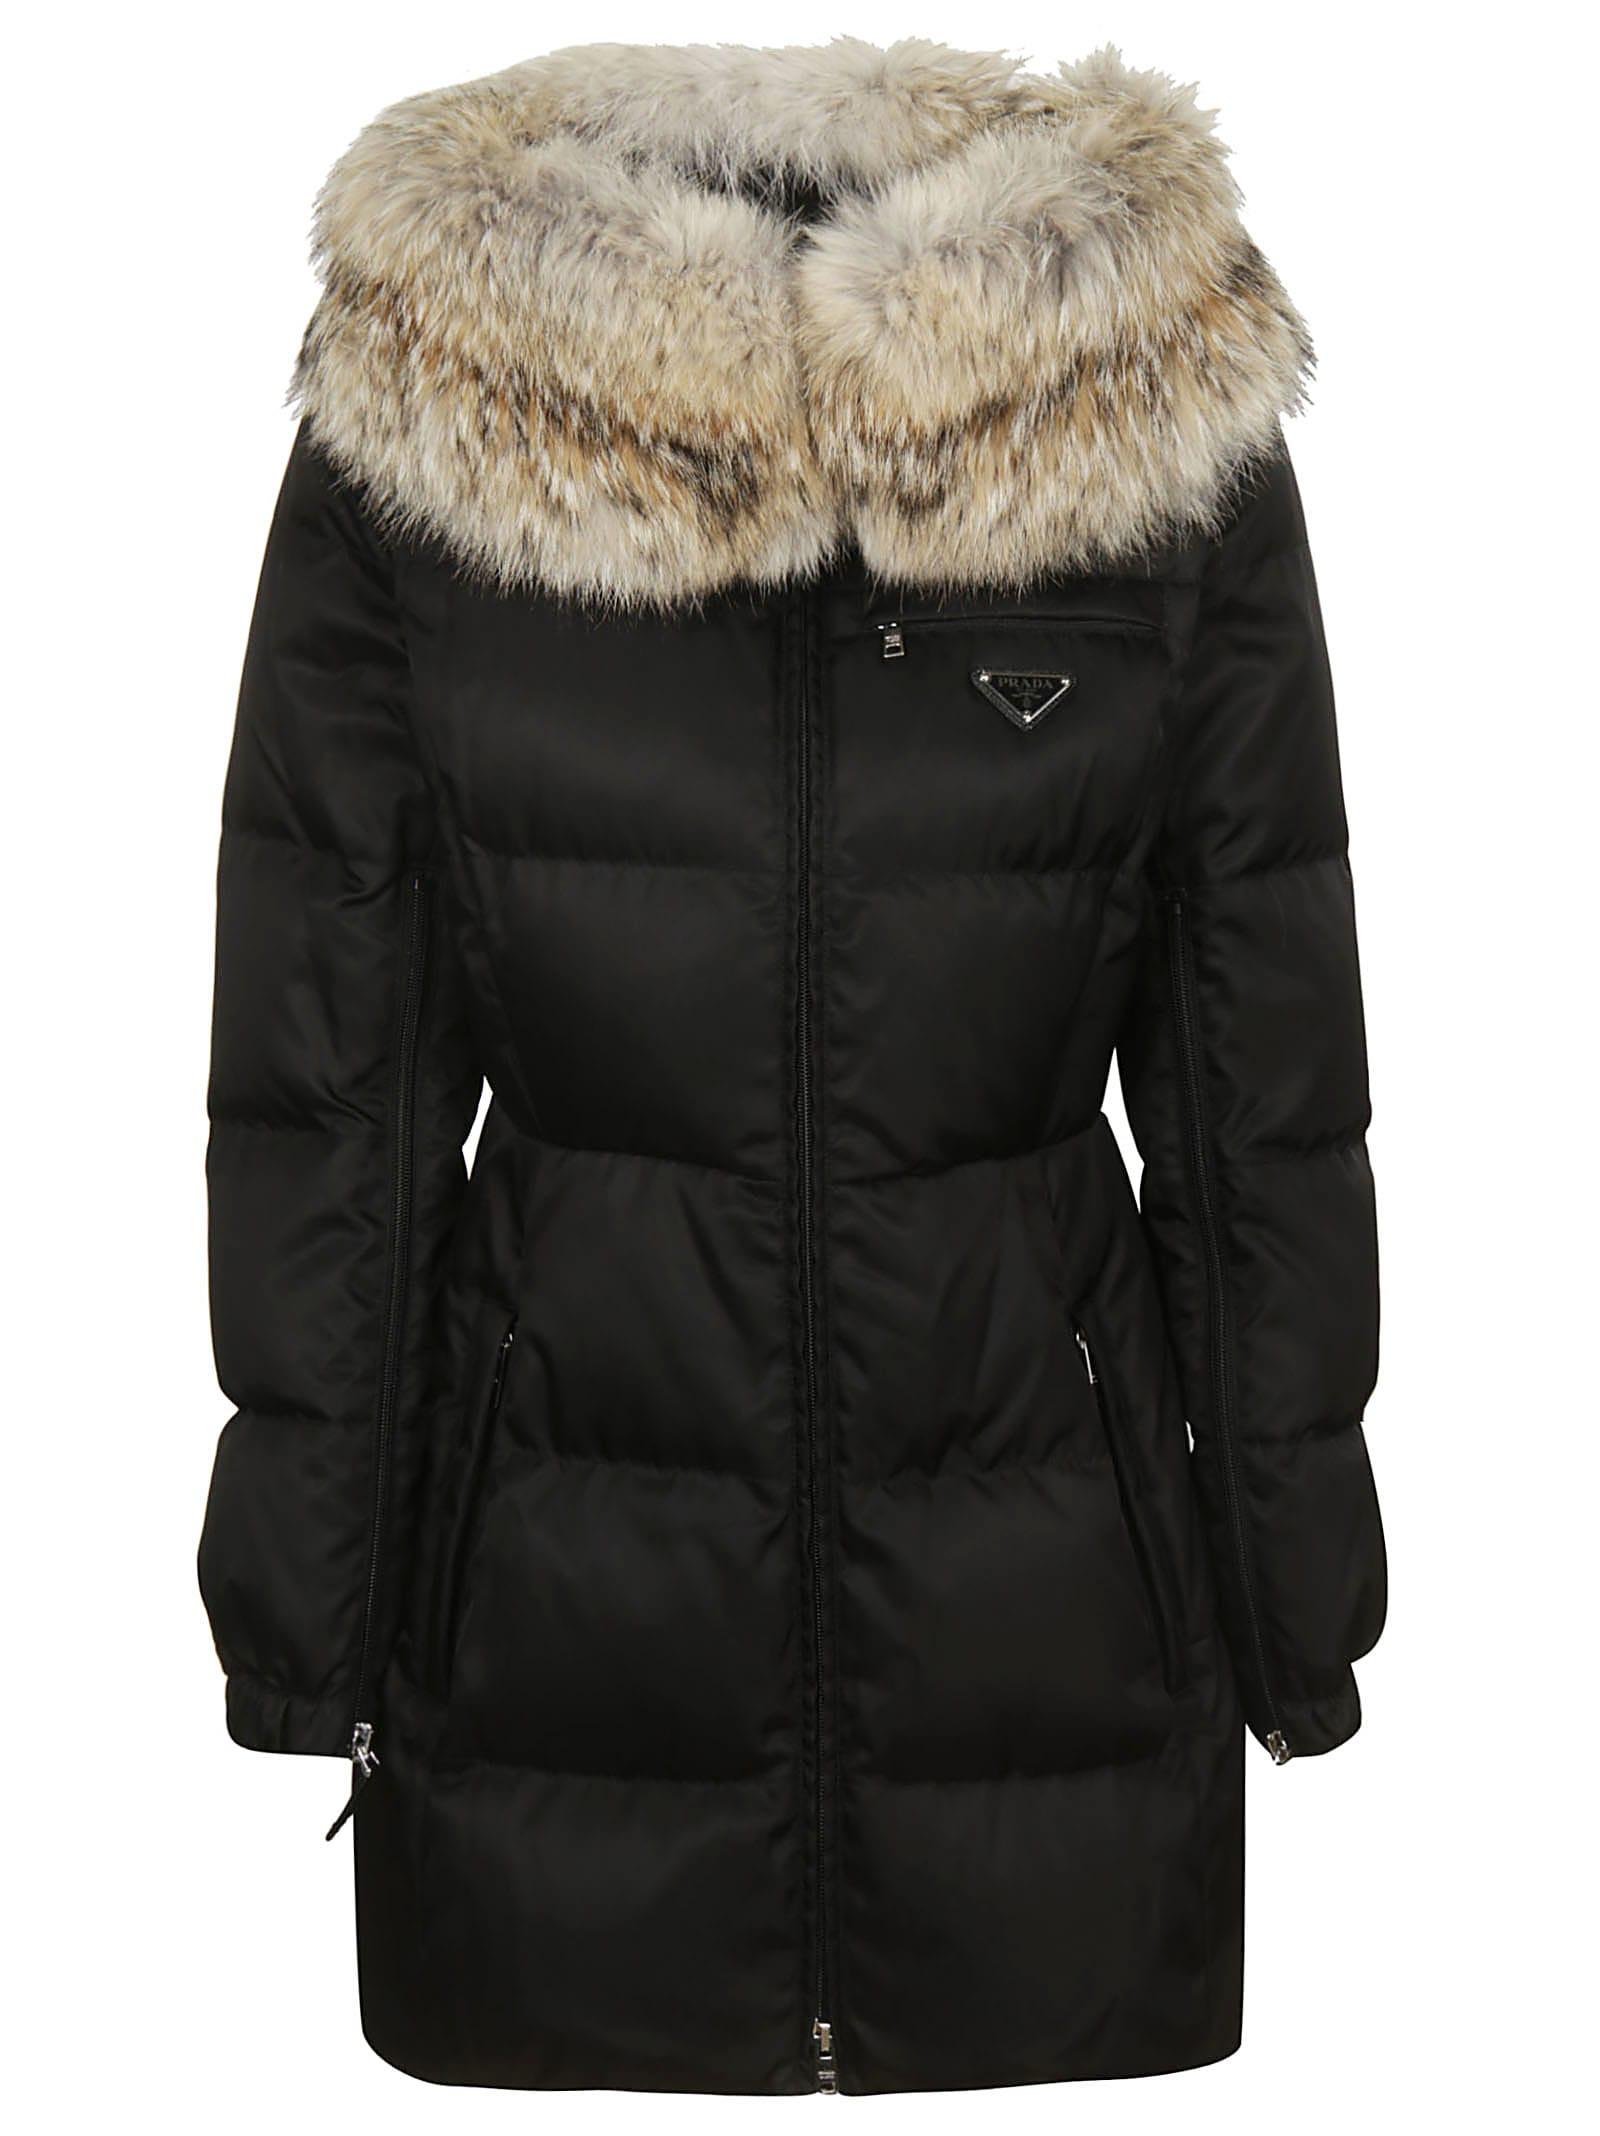 Prada Fur Trim Down Jacket